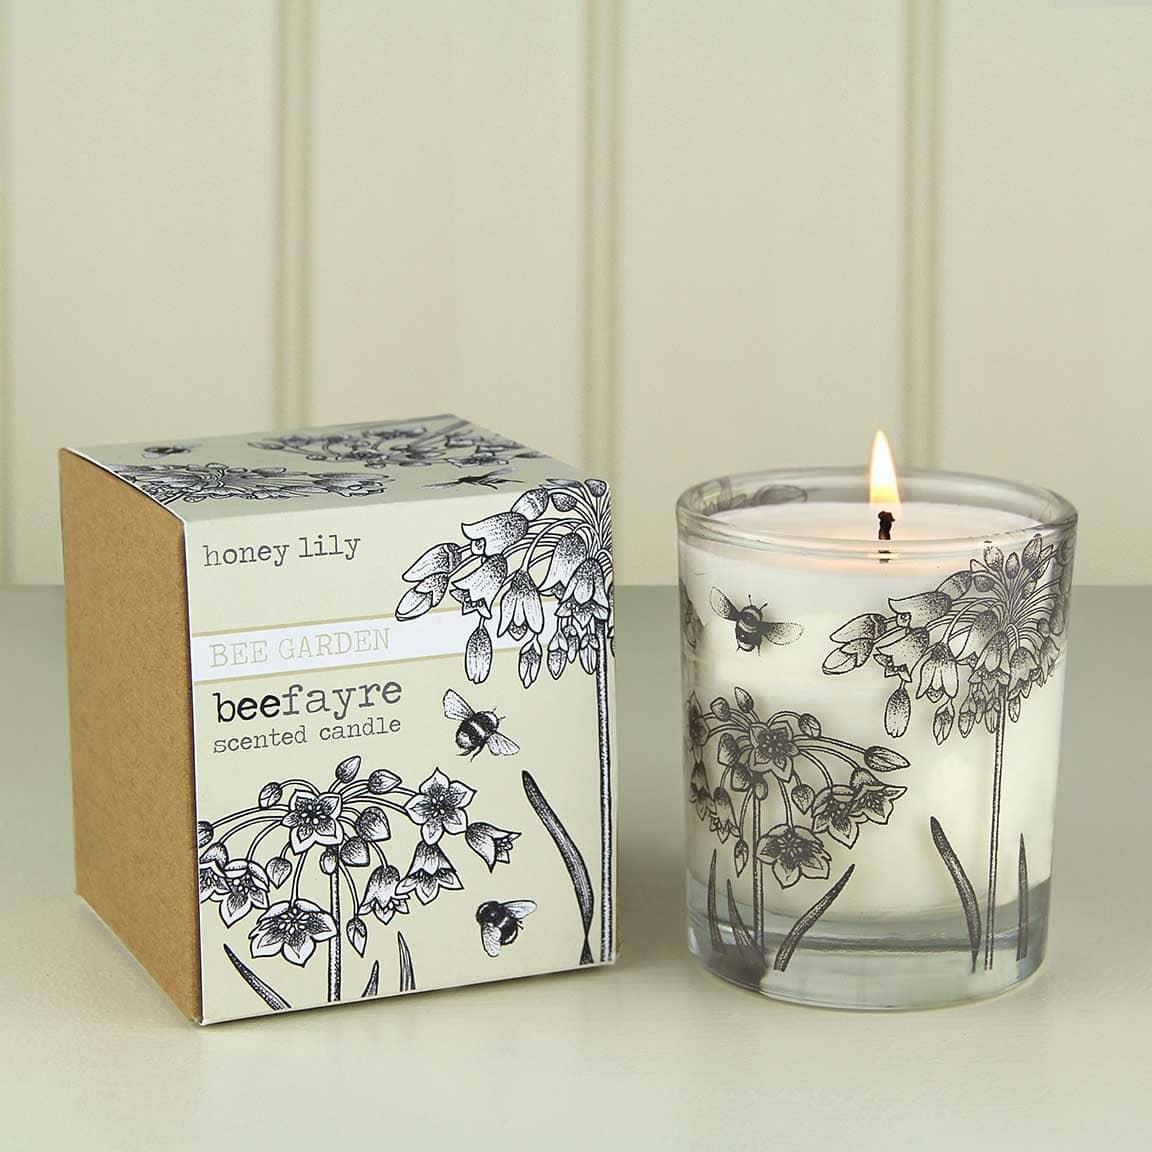 bfl001_honey-lily-large-candle_1.jpg